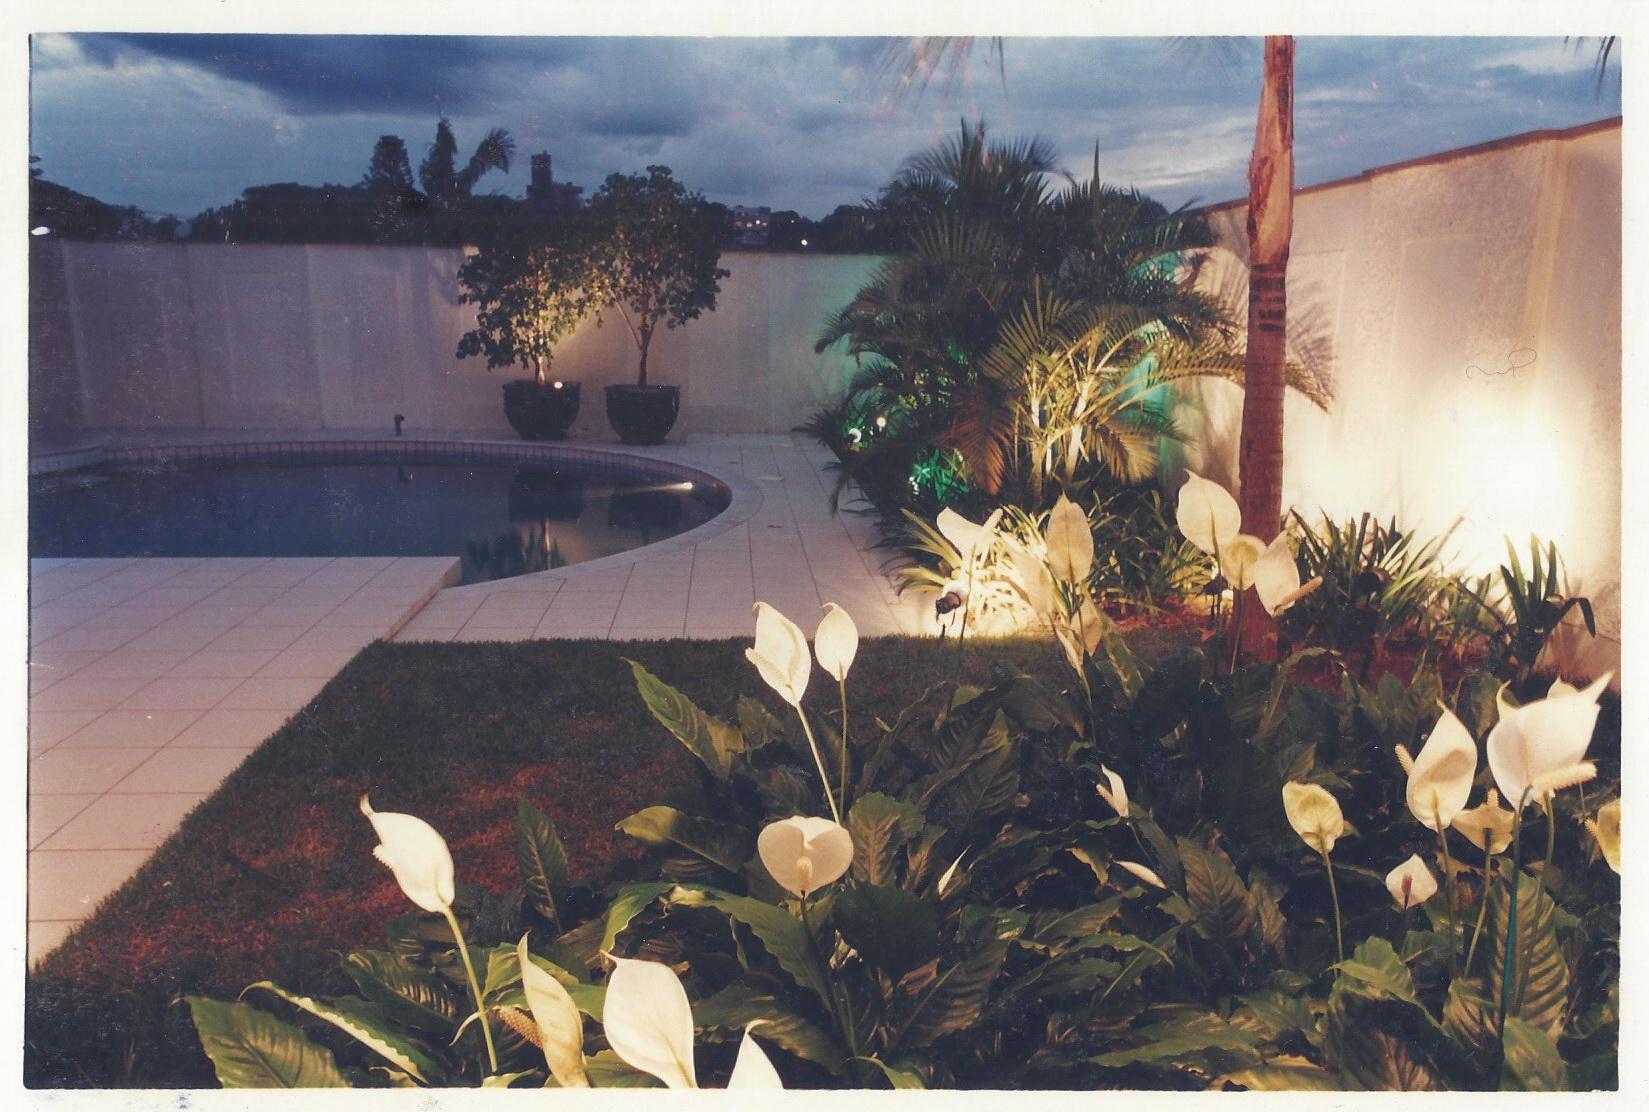 Jardim residencial com arq Helena Karpouzas Foto: Eneida Serrano